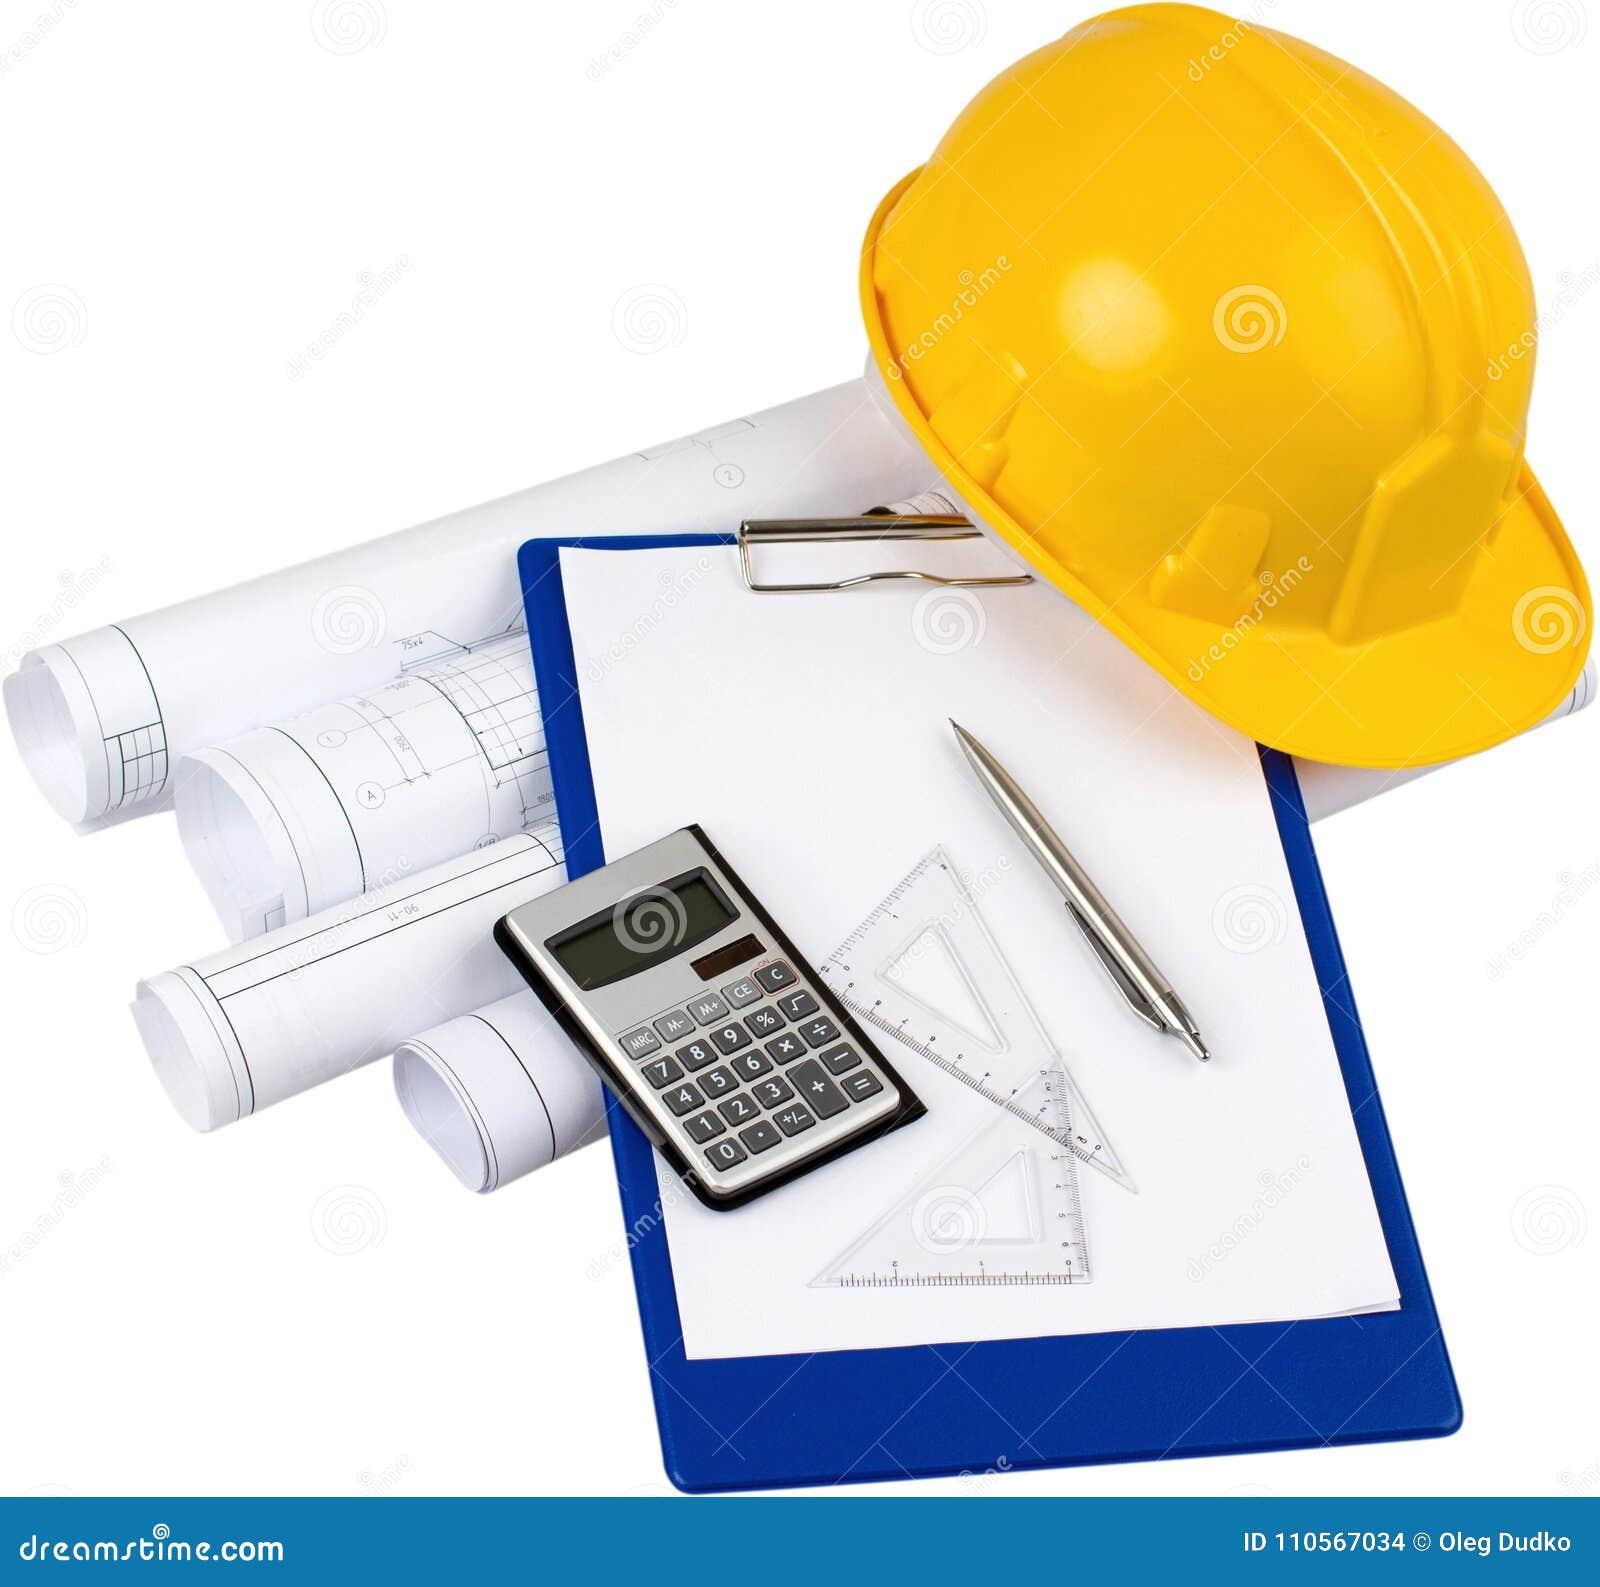 Budowa plany, kalkulator, Setquares, pióro